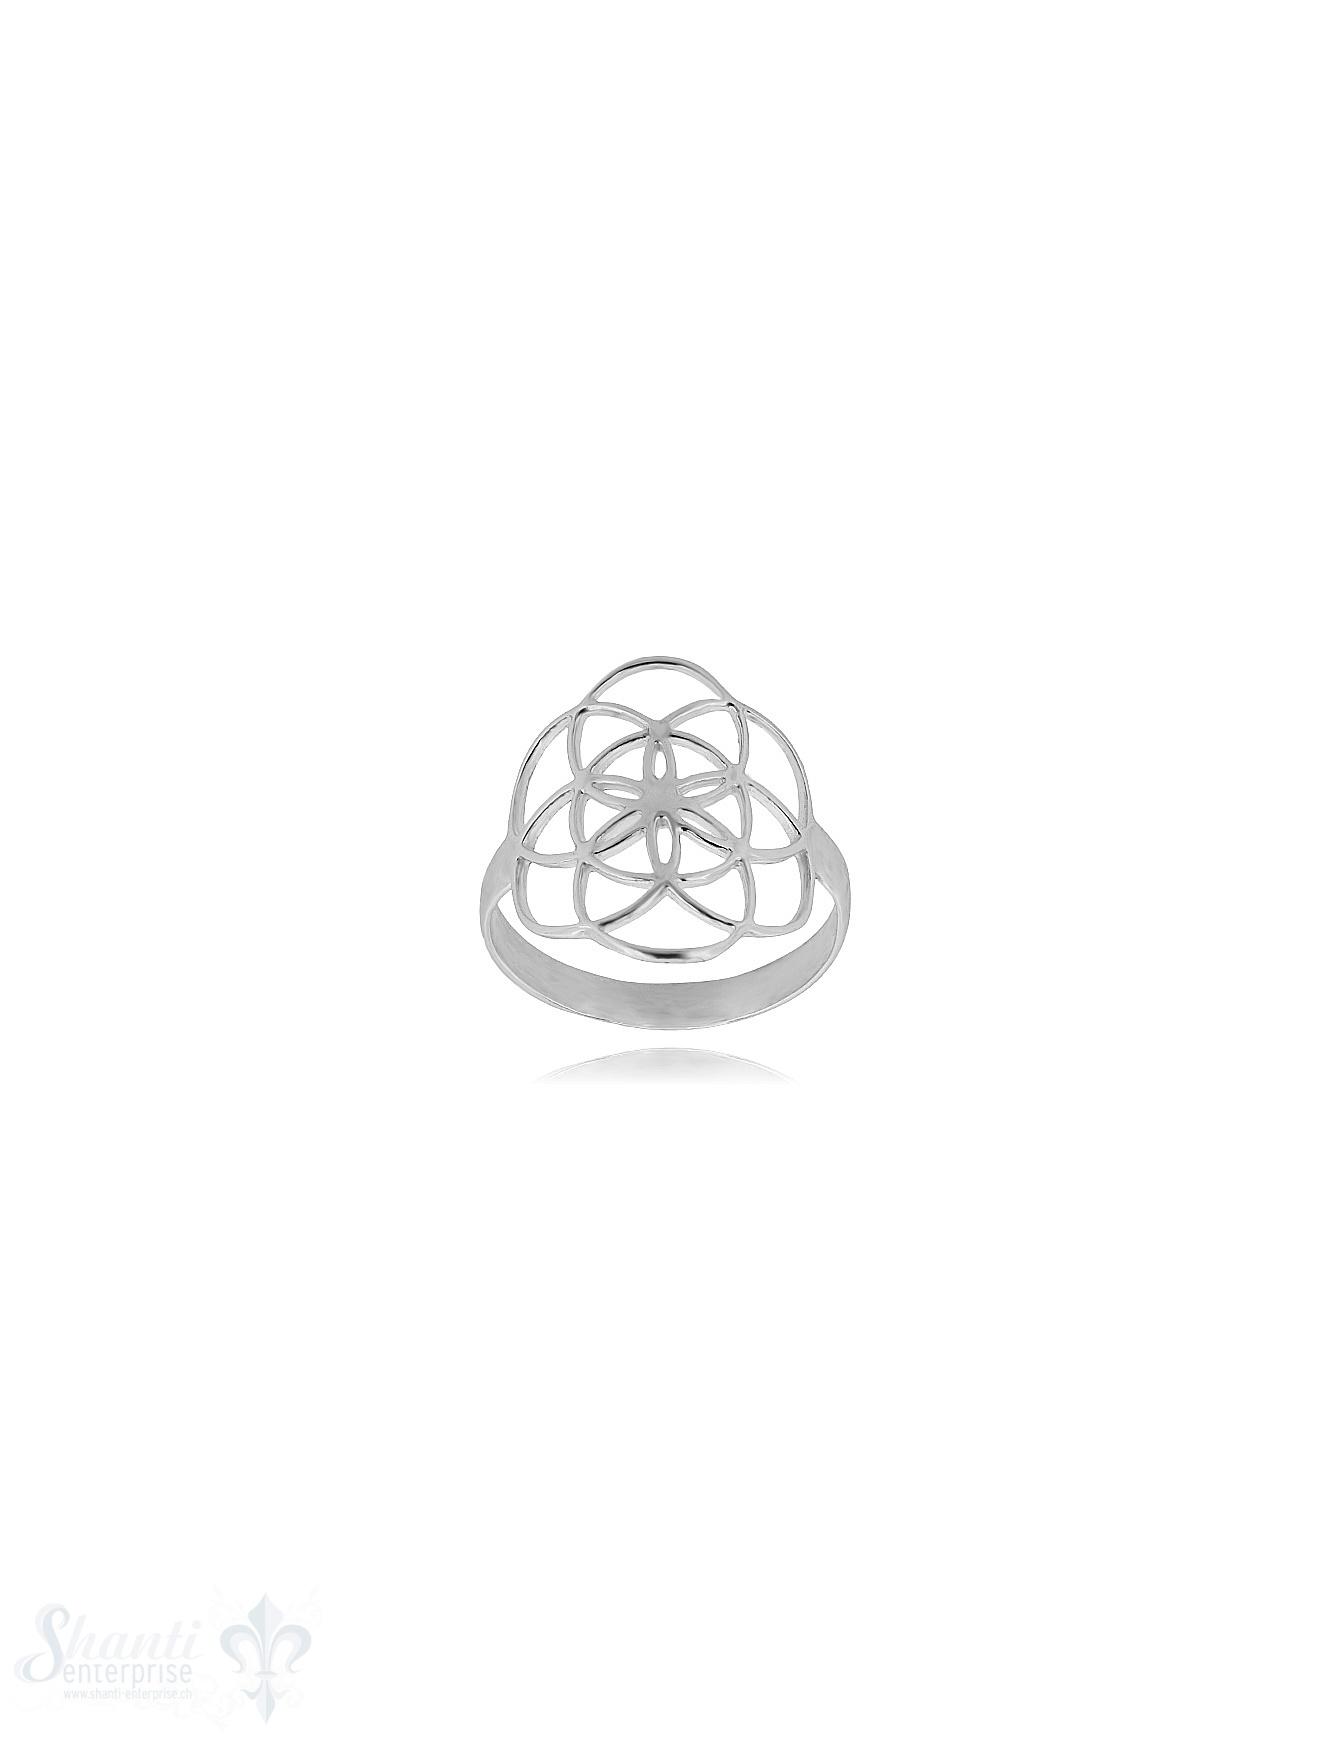 Symbol Yijing Silberring 18x15 mm durchbrochen gebogen  Schiene 3 mm breit (= Wandlung) Silber 925 poliert